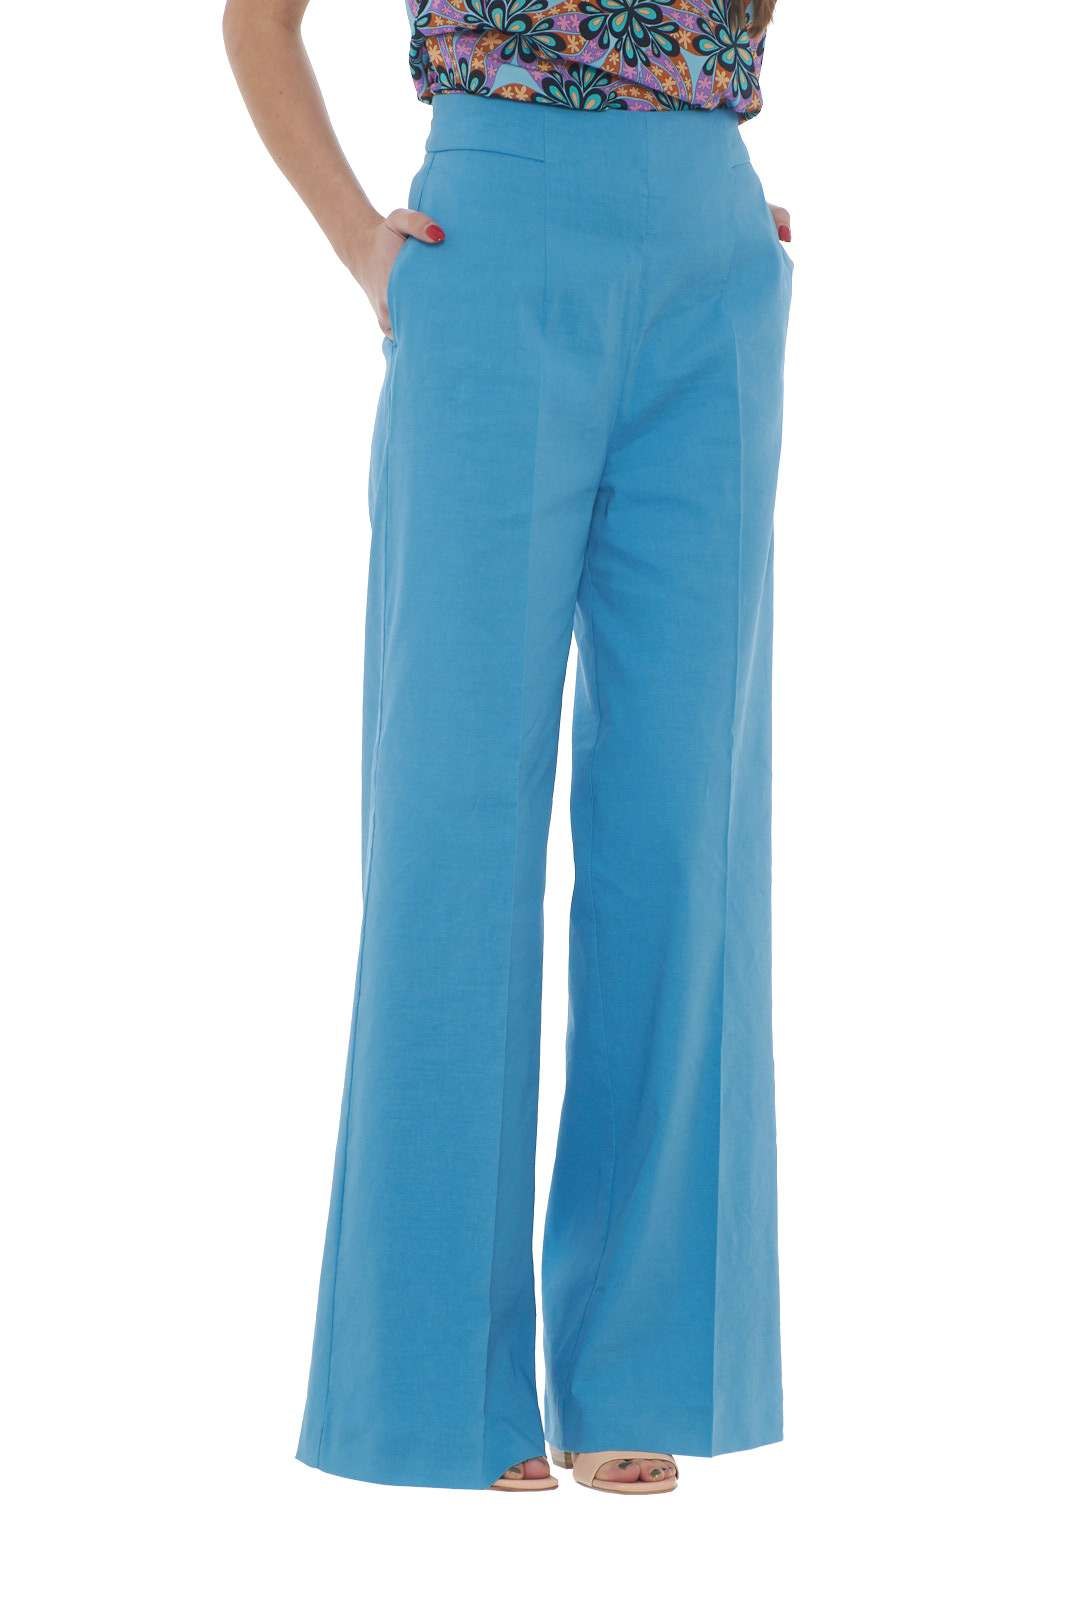 https://www.parmax.com/media/catalog/product/a/i/PE-outlet_parmax-pantaloni-donna-Pinko-1b14f3-A.jpg